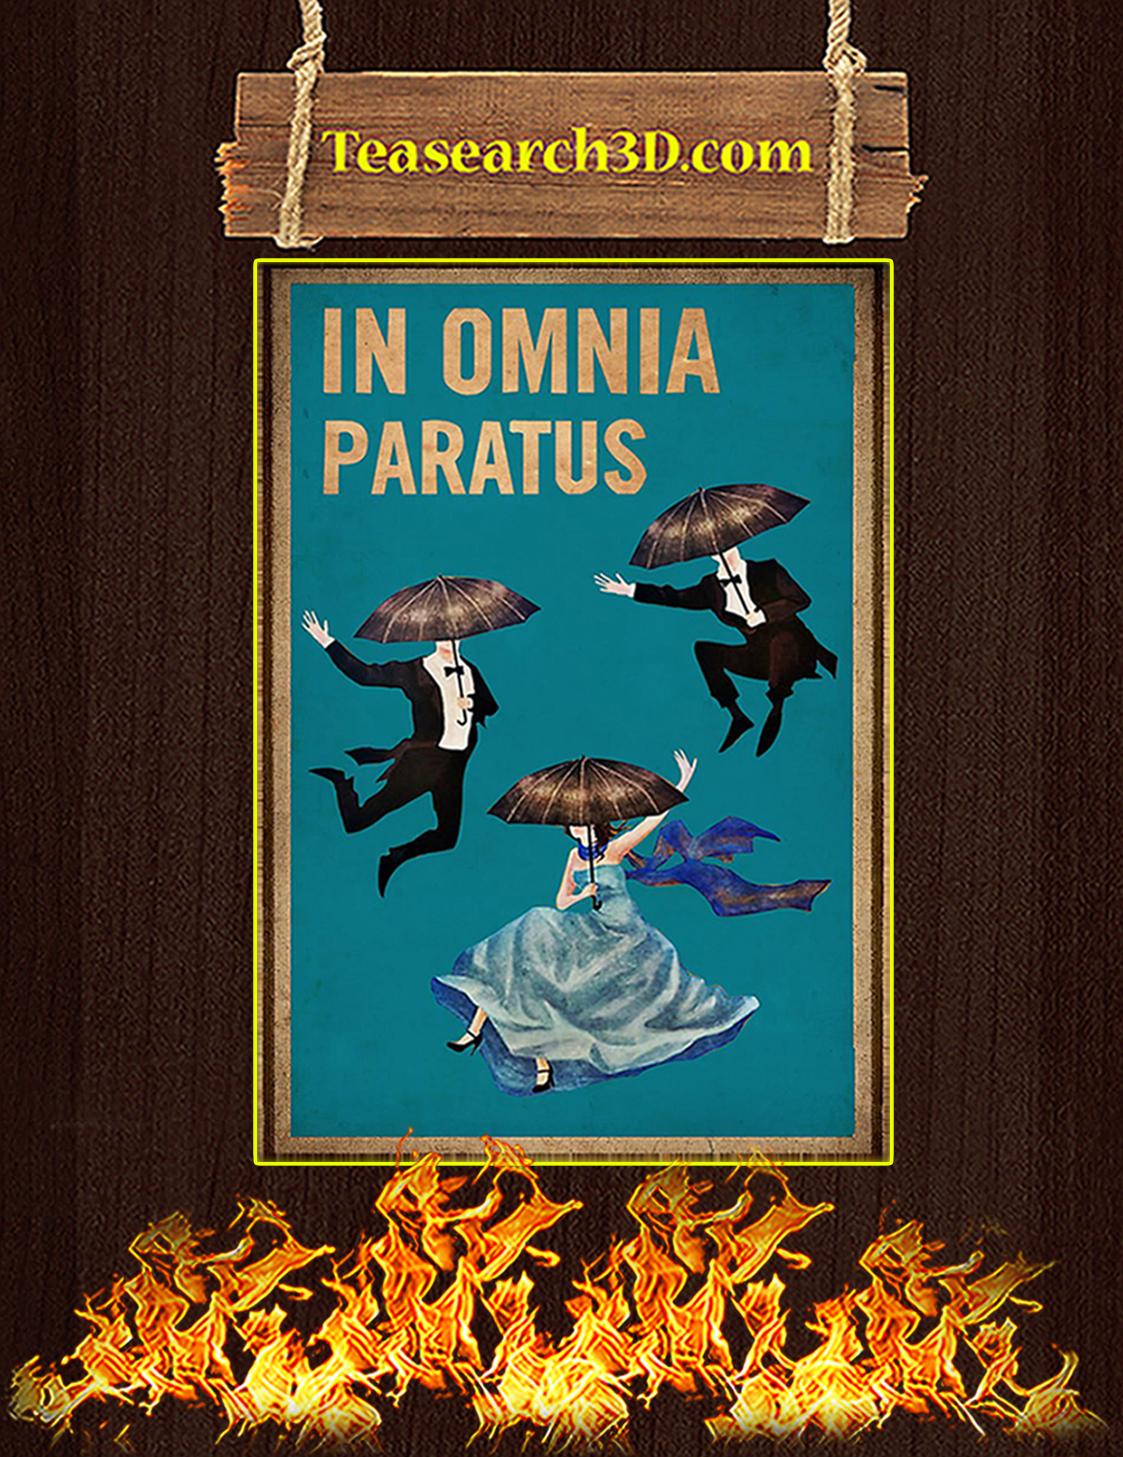 In omnia paratus poster A3